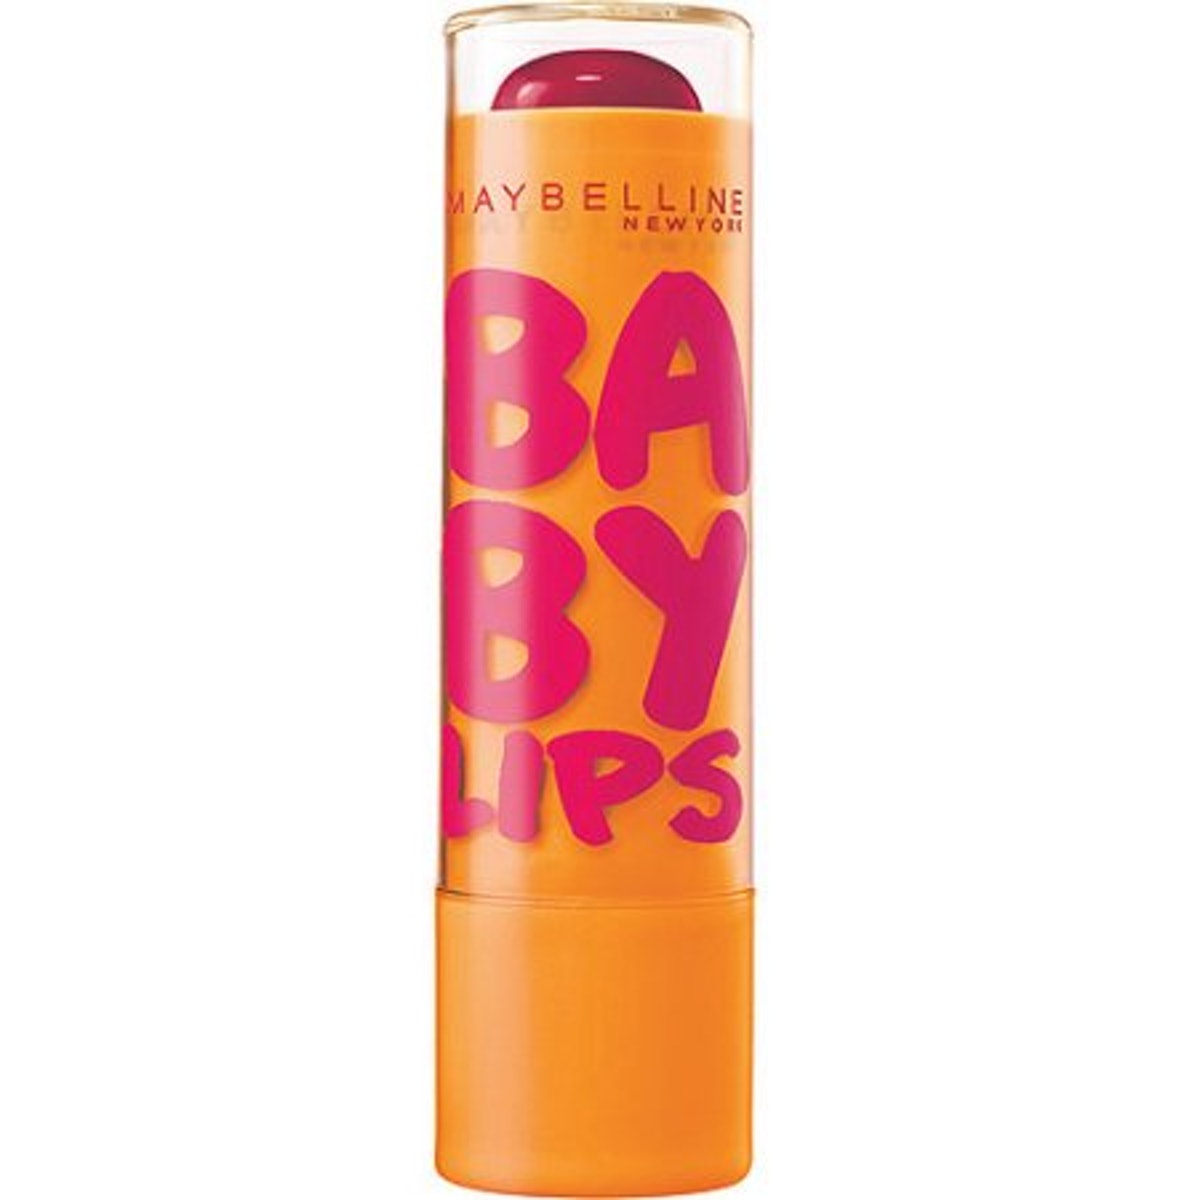 Baby Lips Moisturizing Lip Balm in Cherry Me